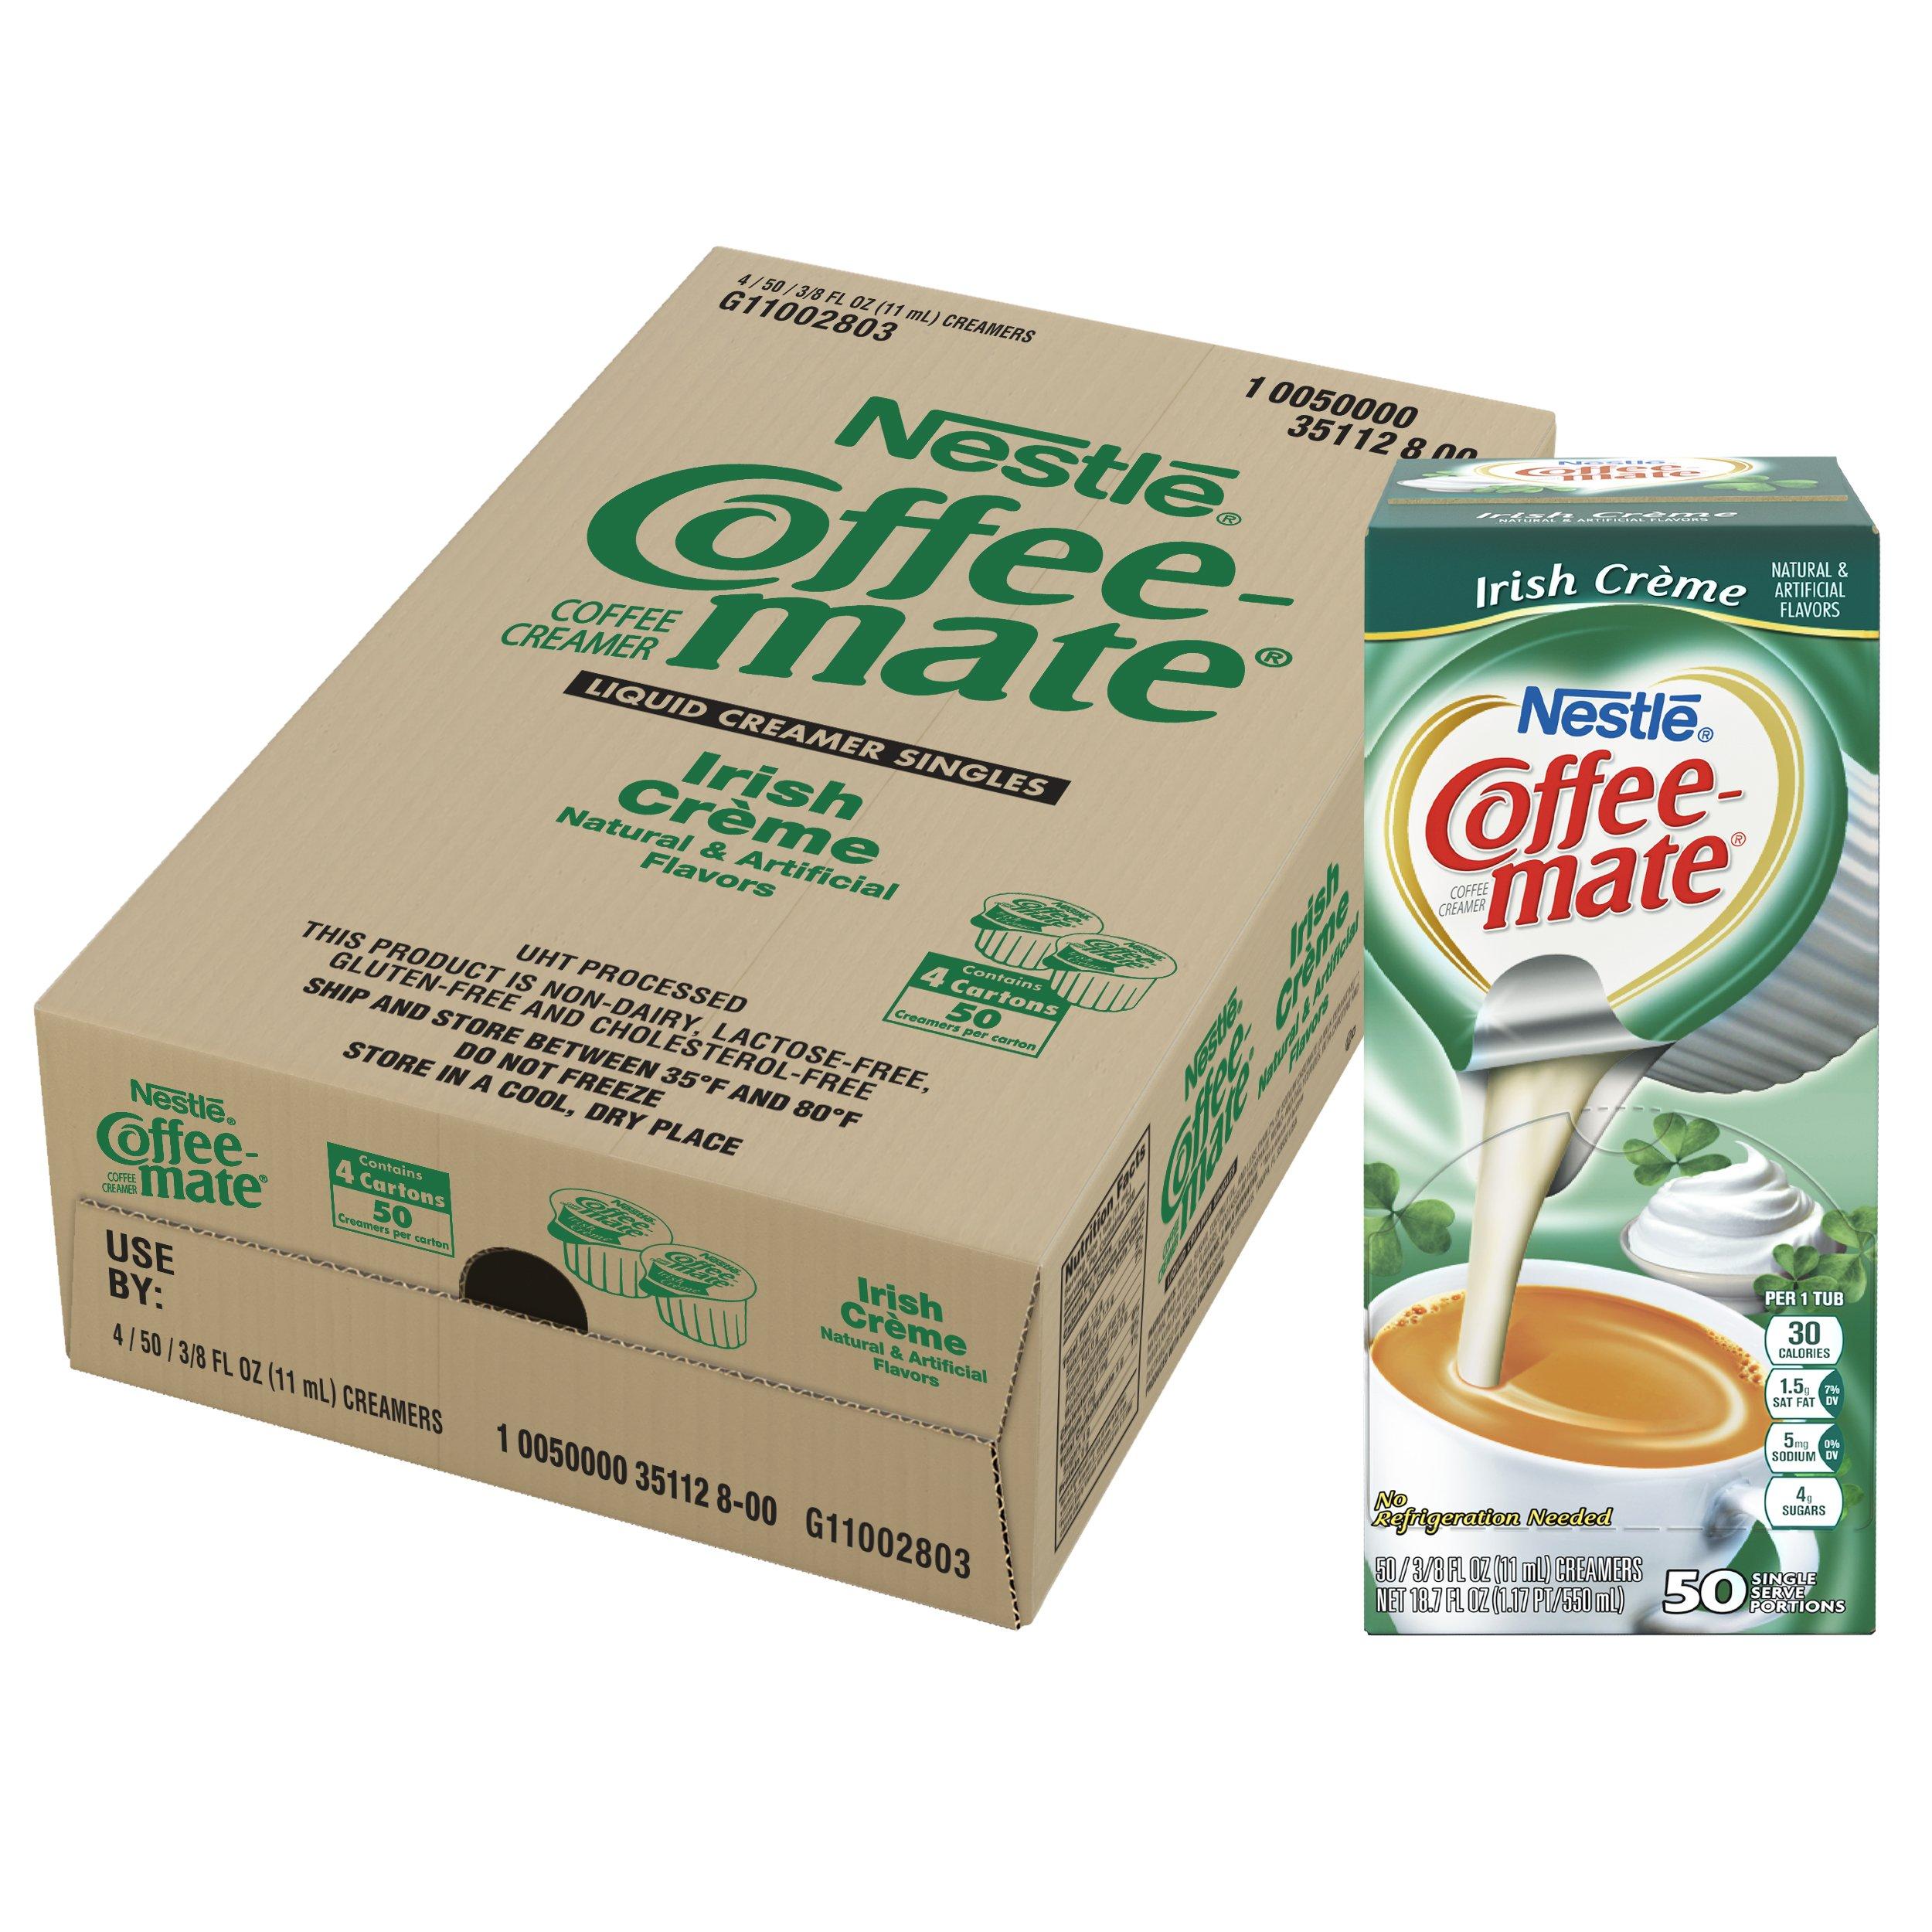 NESTLE COFFEE-MATE Coffee Creamer, Irish Creme, liquid creamer singles, Pack of 200 by Nestle Coffee Mate (Image #6)